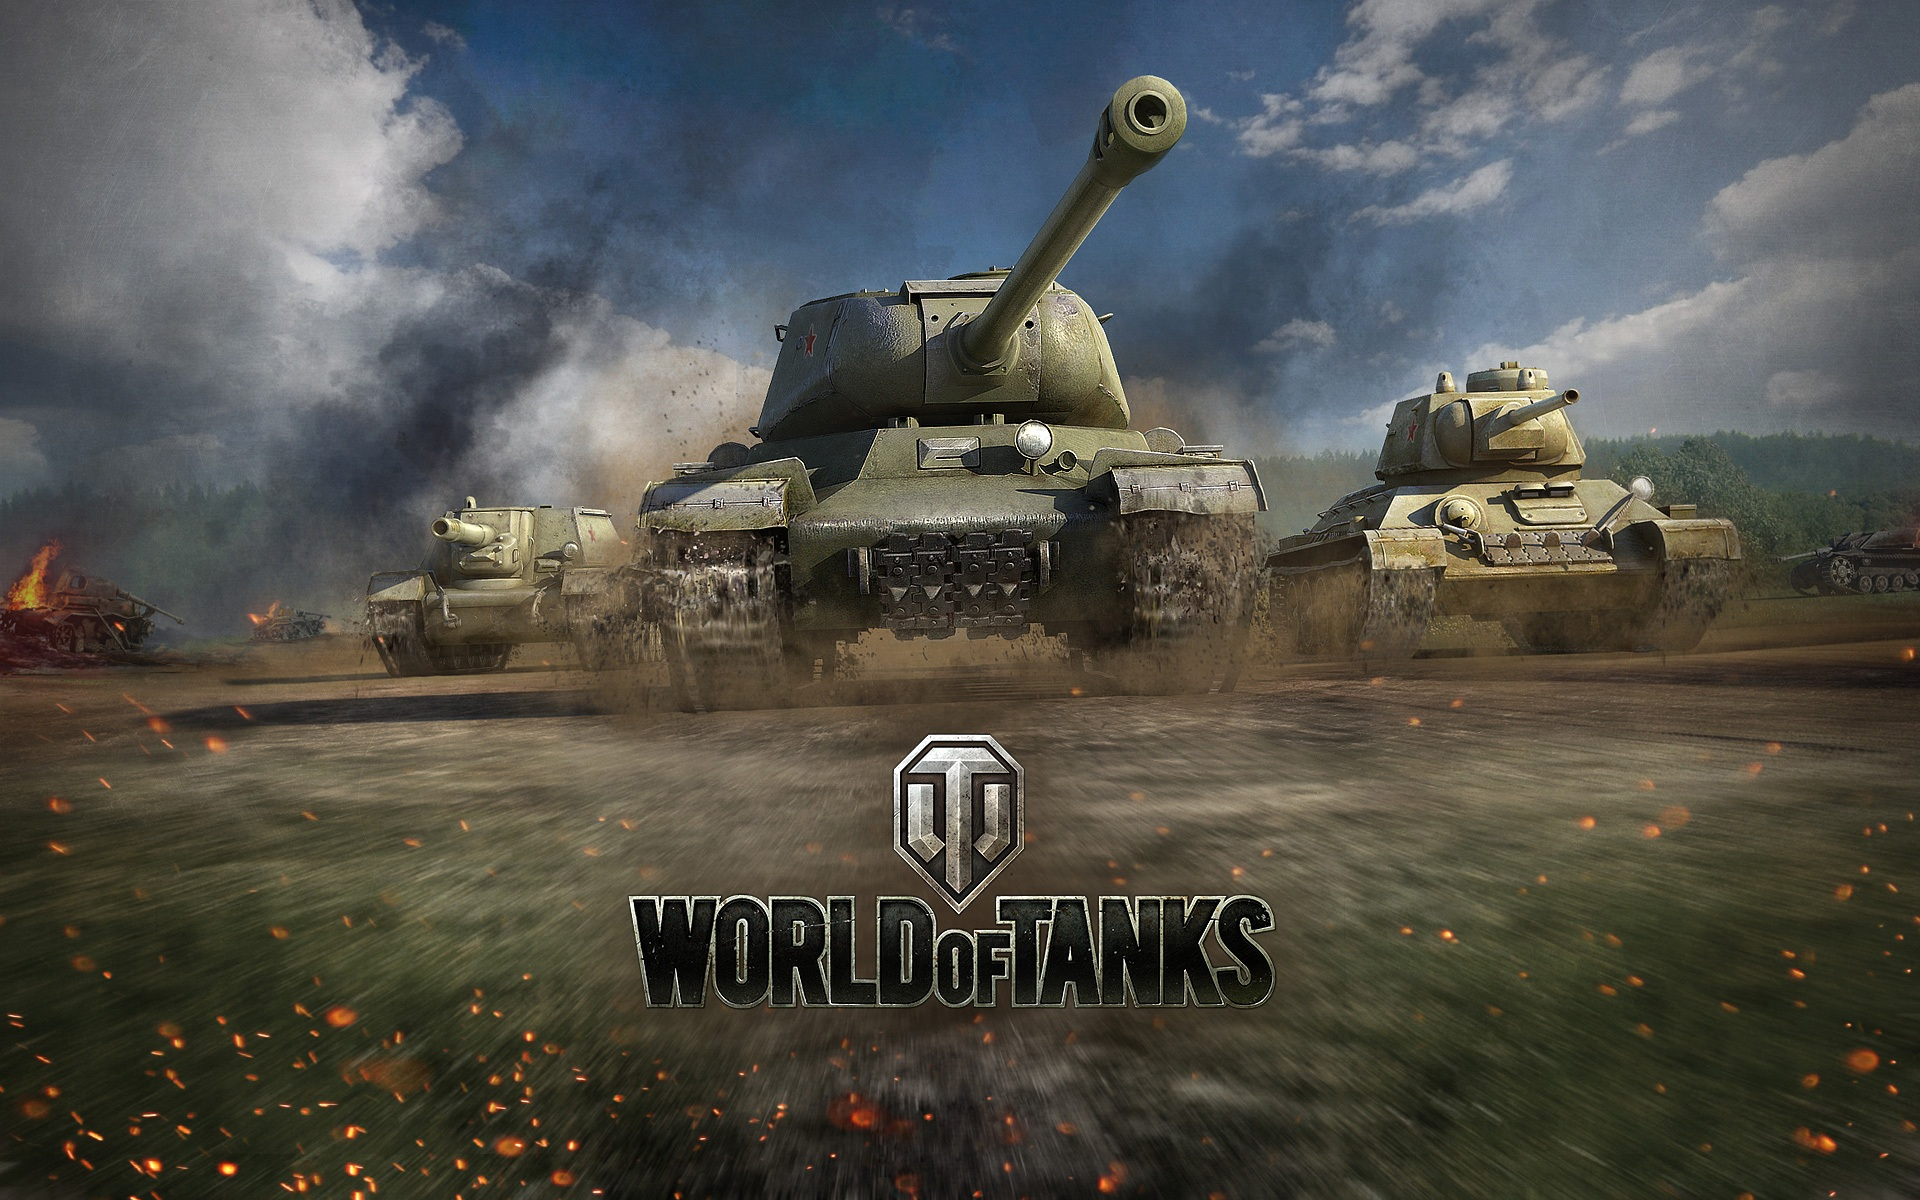 world of tanks HD